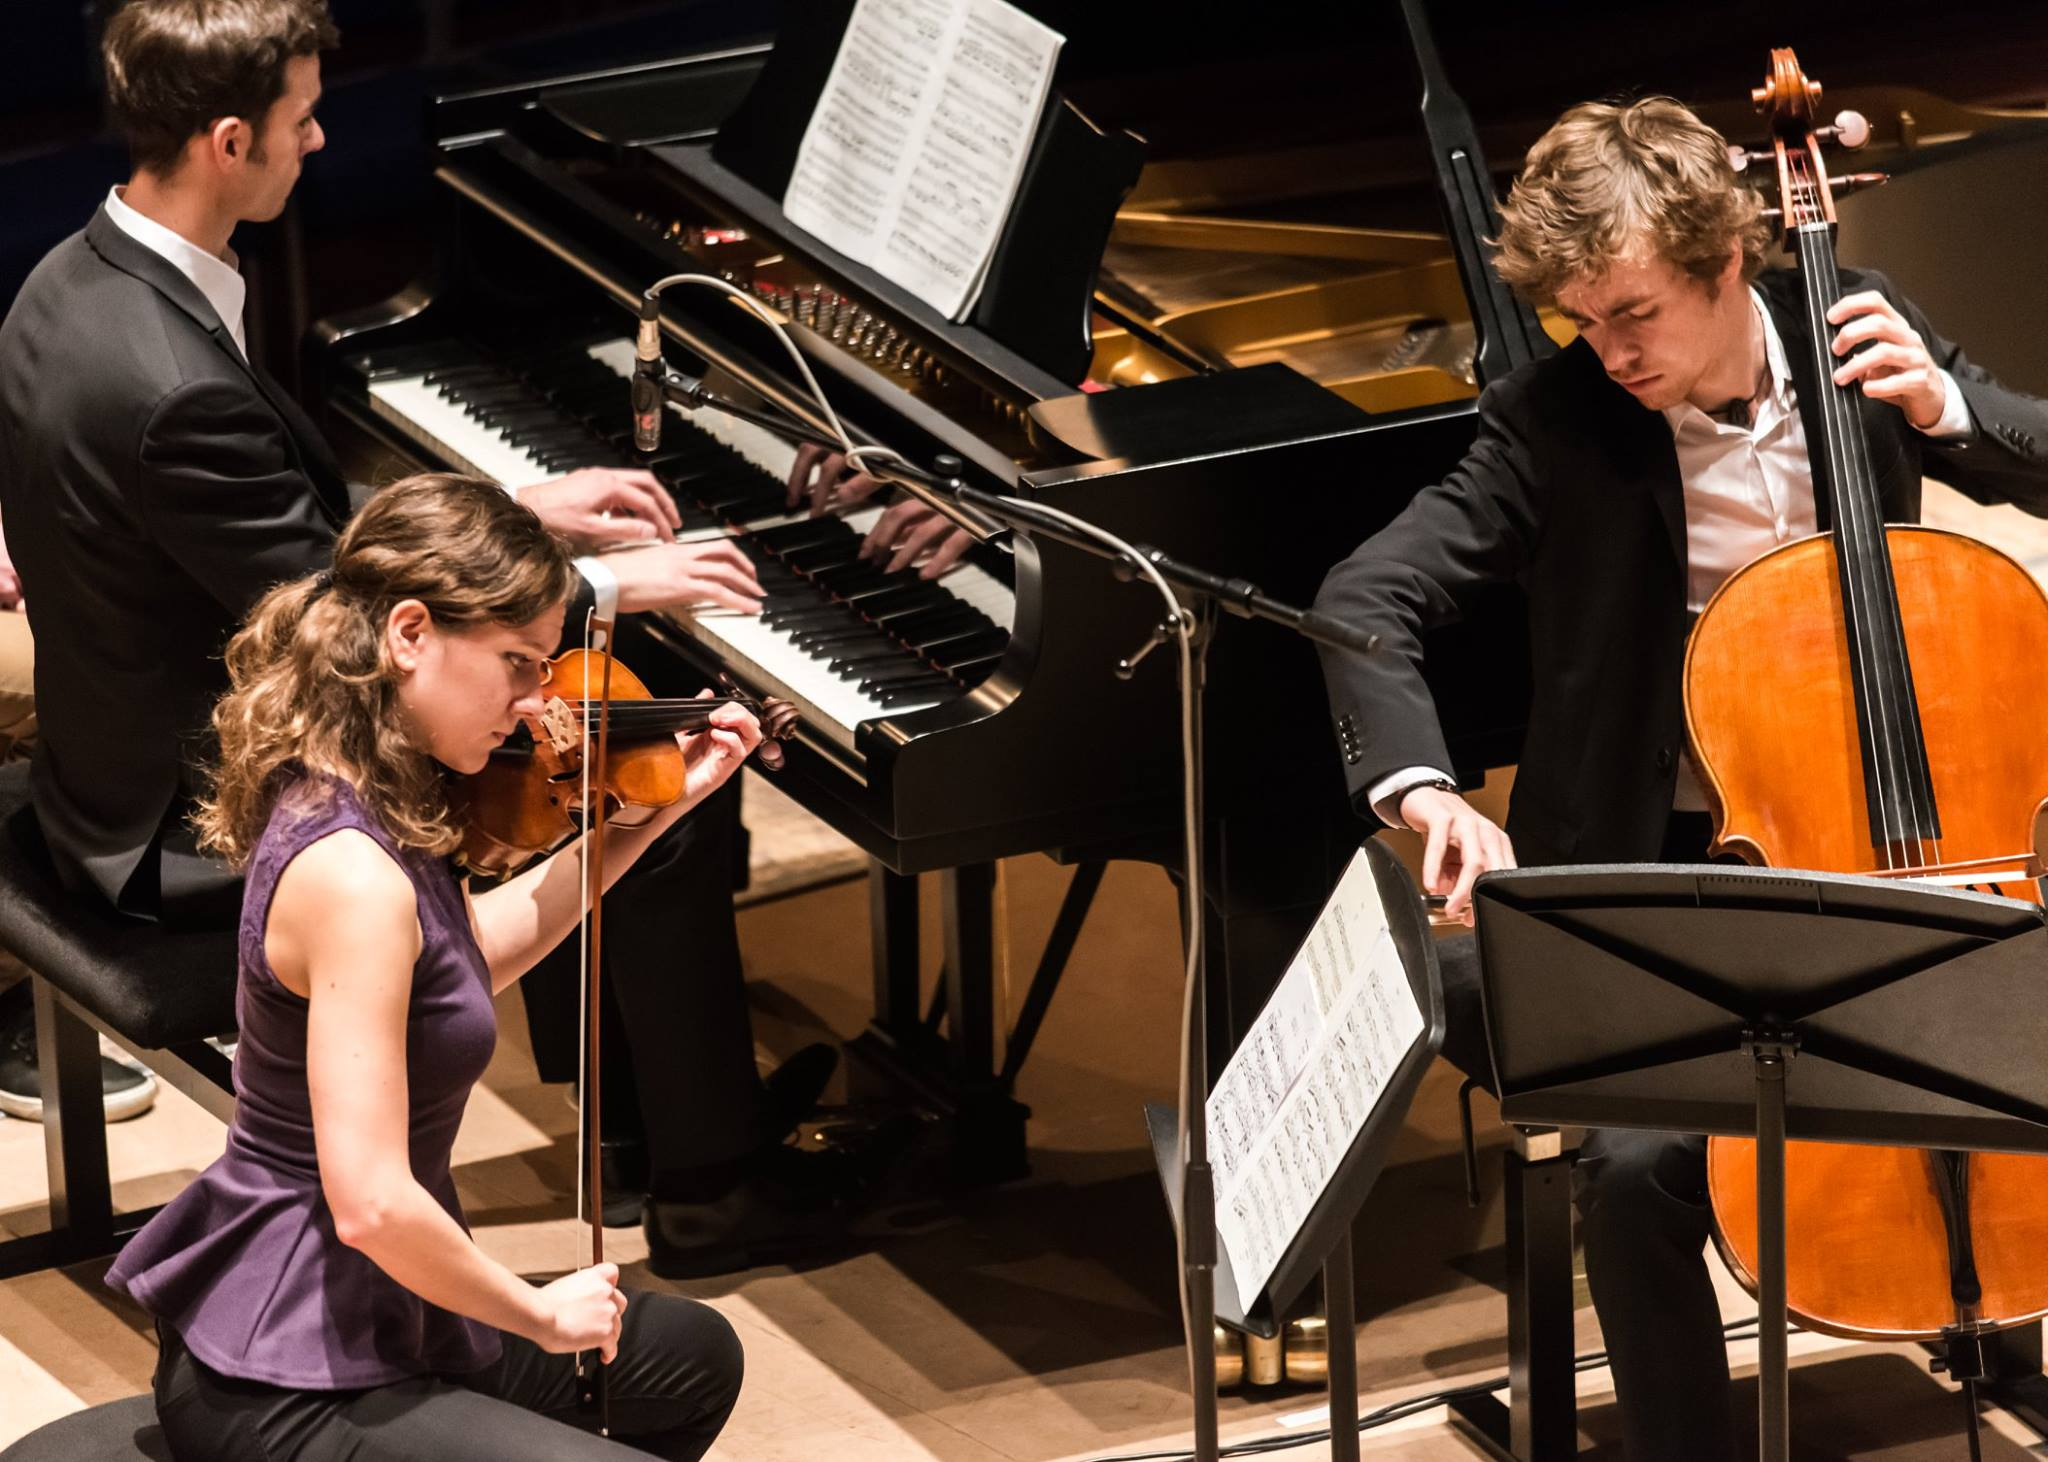 Cc : Alex Schröder  ECMA /  Koninklijk Conservatorium - Royal Conservatoire , La Haye (Pays-Bas)